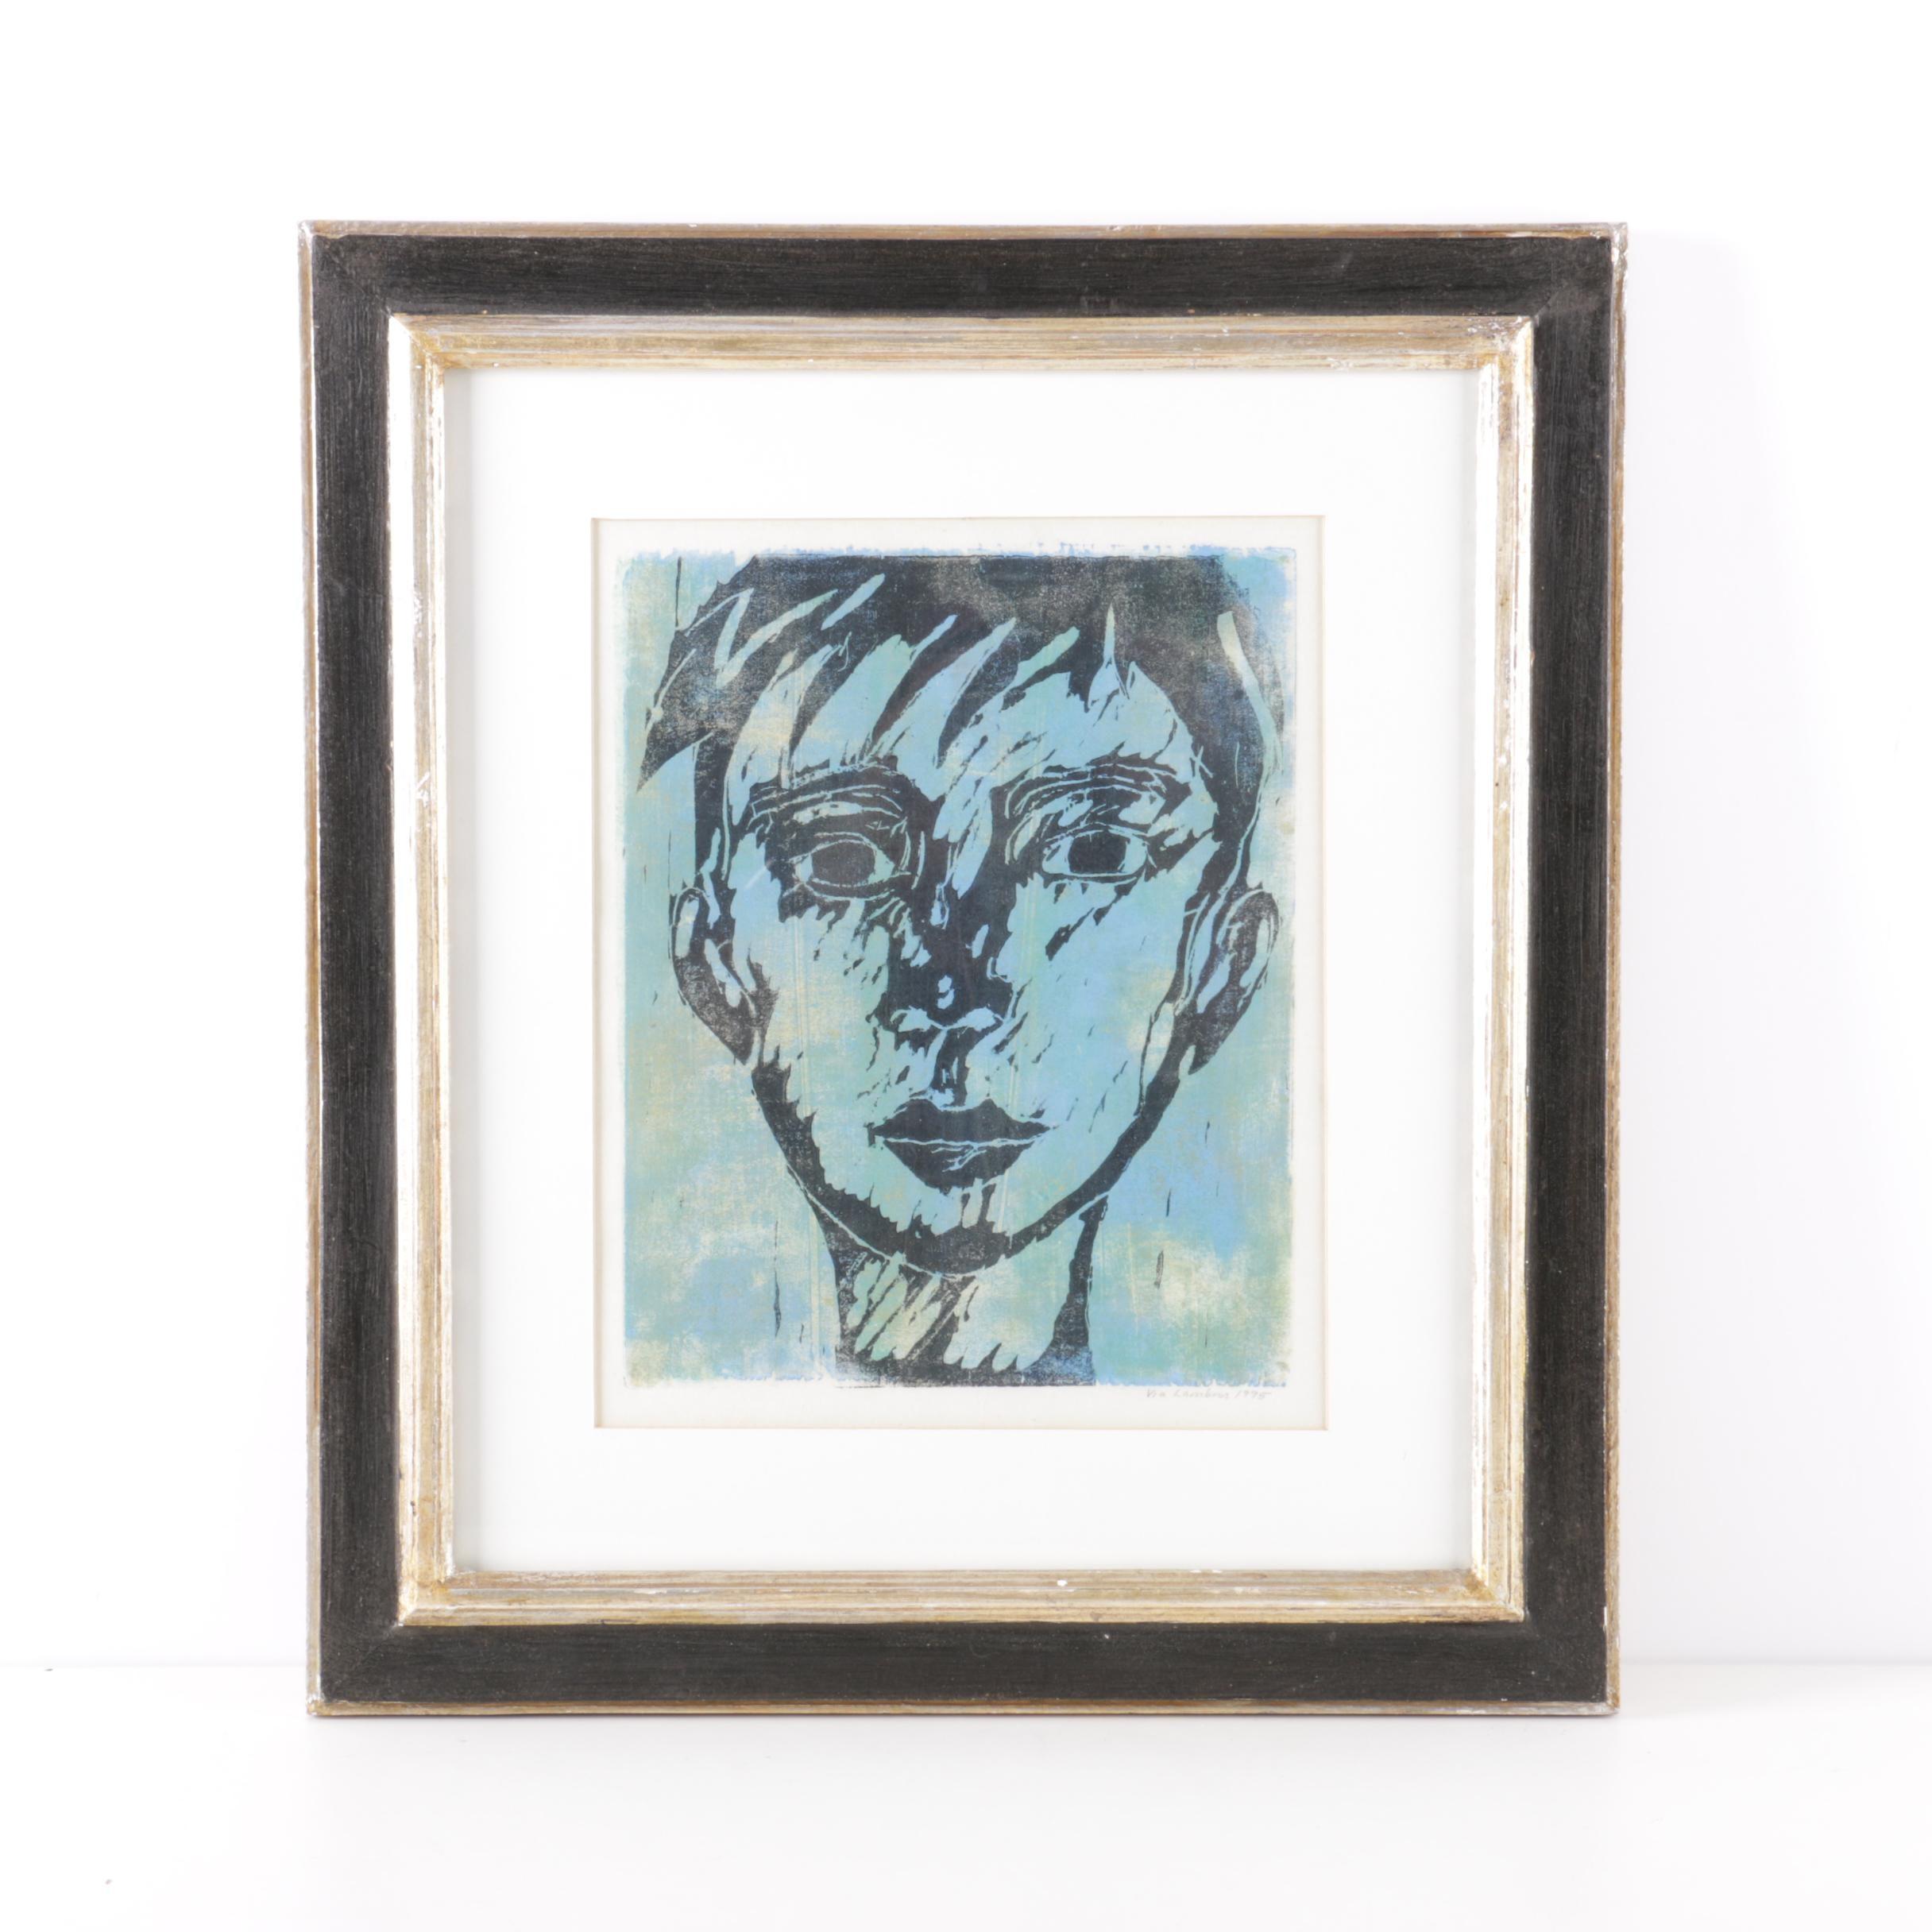 1995 Via Lambros Woodblock Print of a Young Face